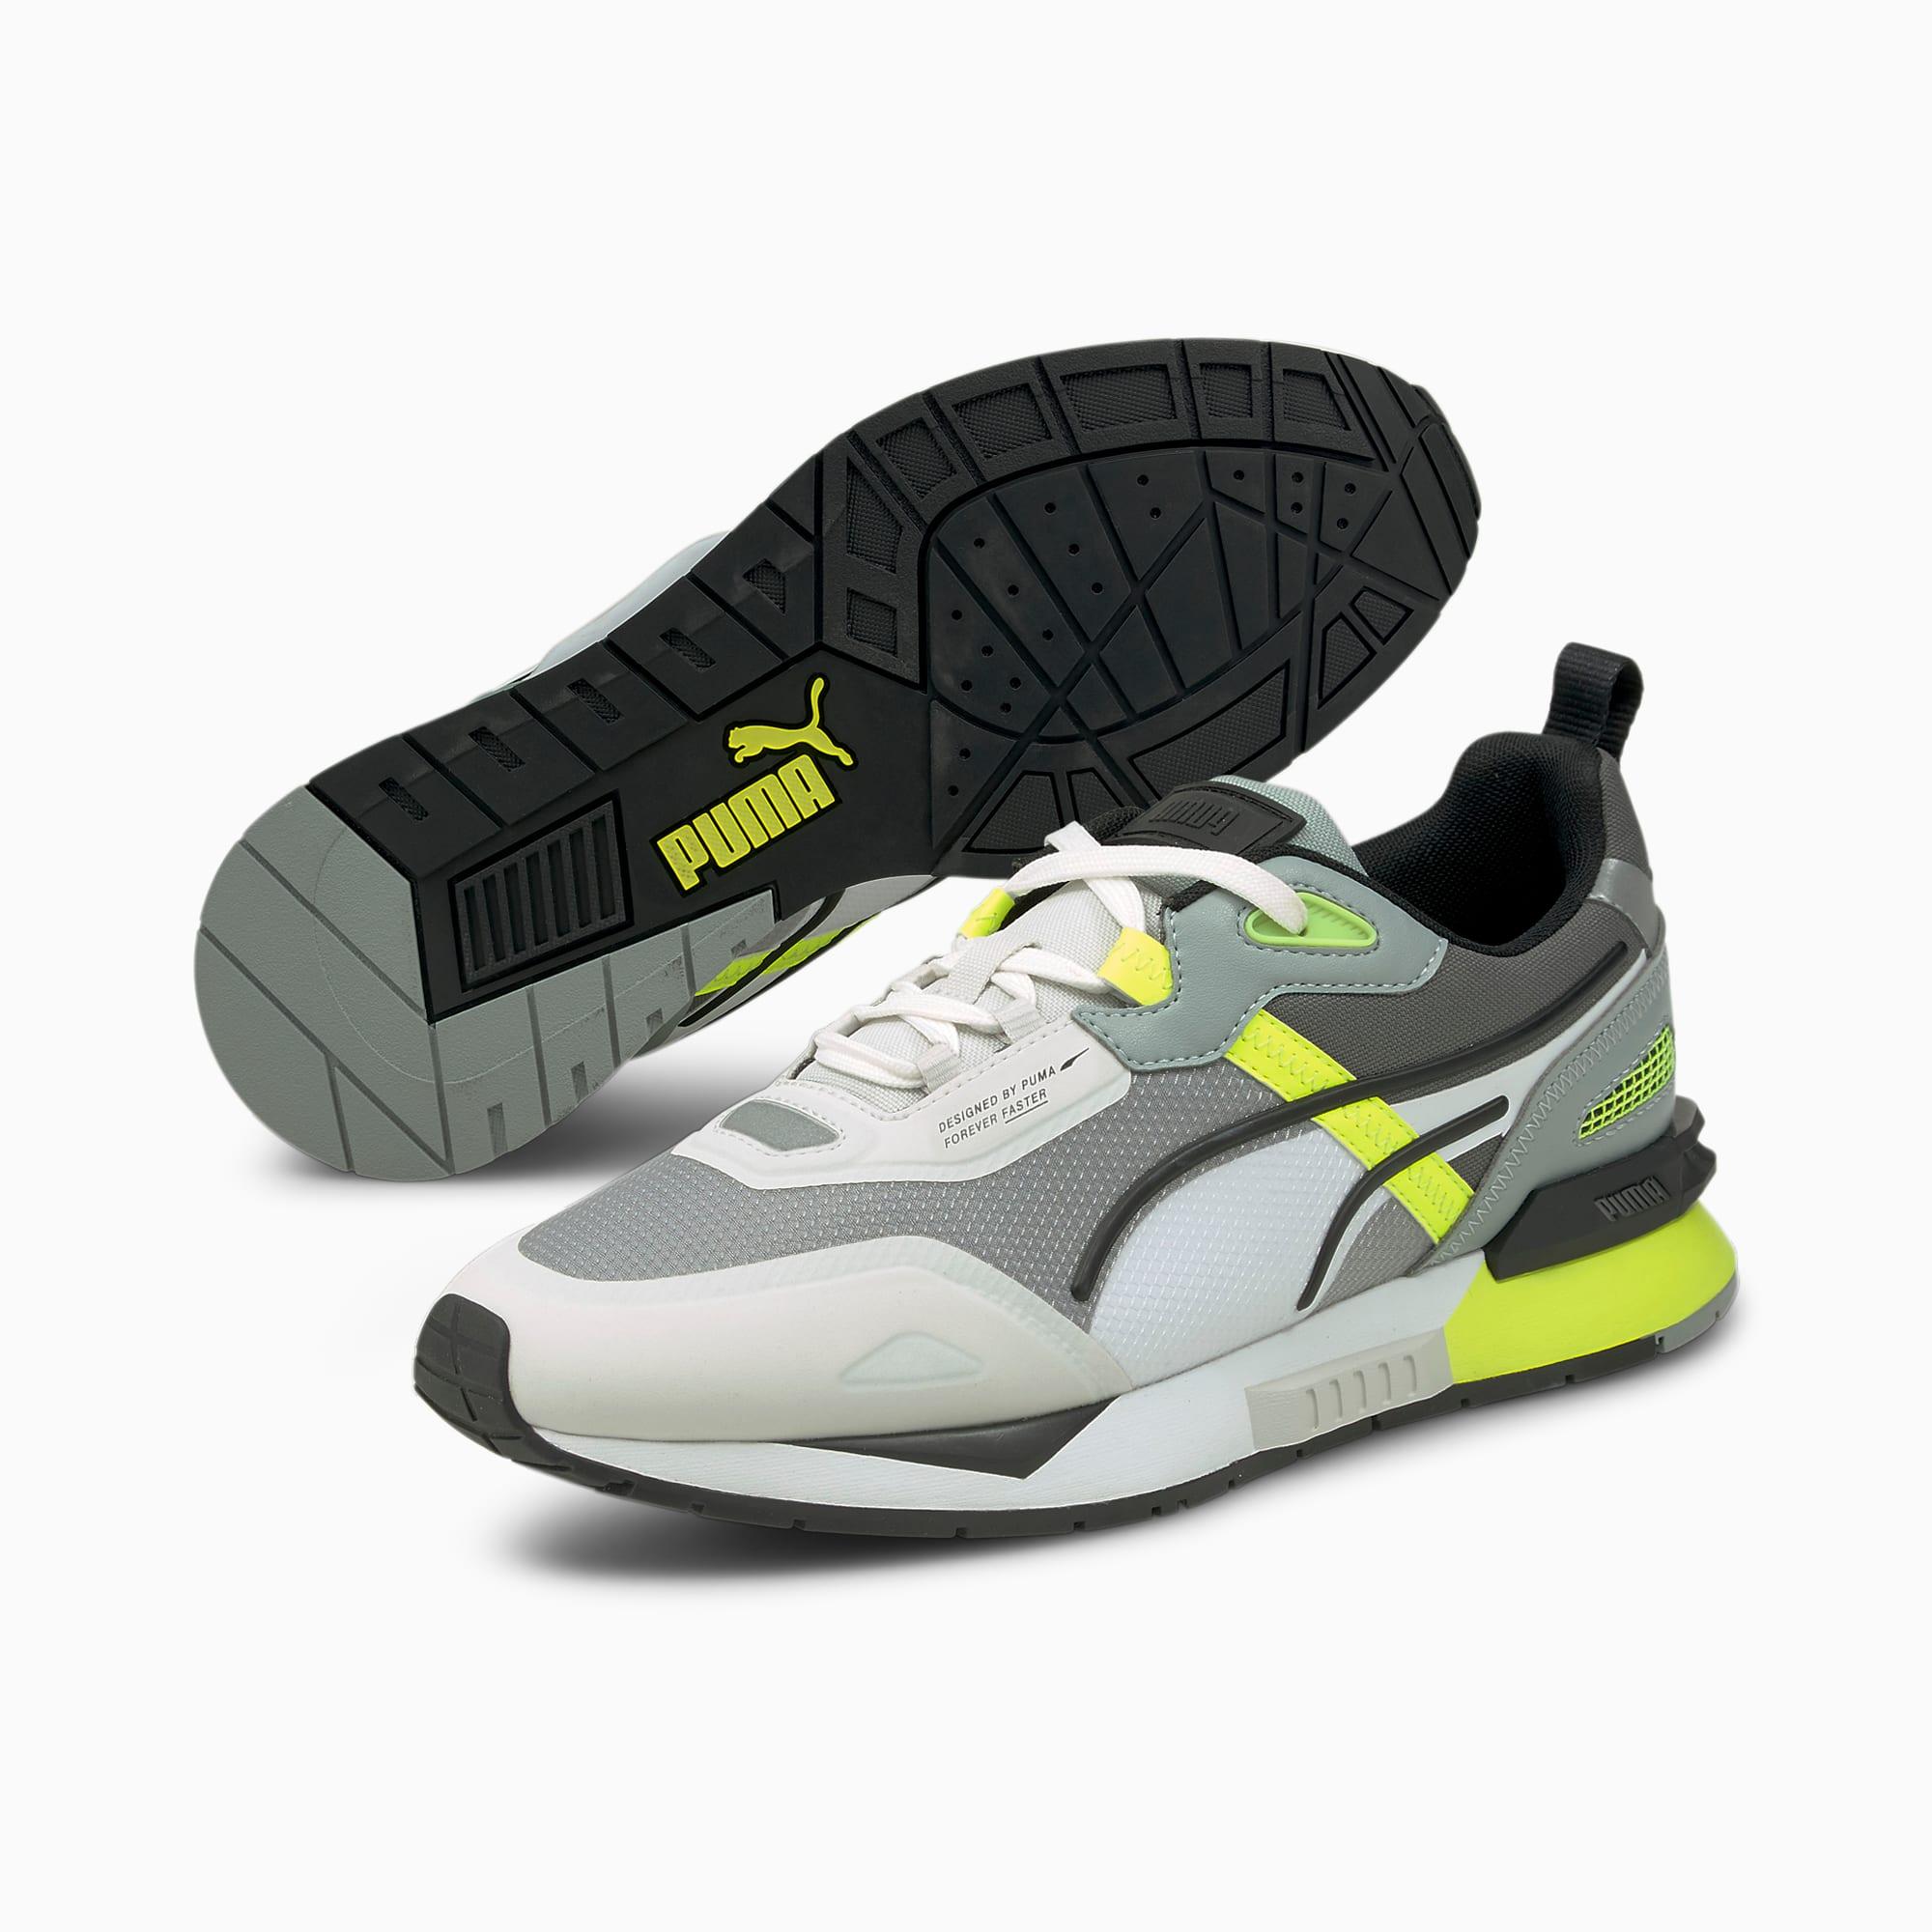 Mirage Tech Sneakers Nimbus Cloud-Quarry-Yellow Alert